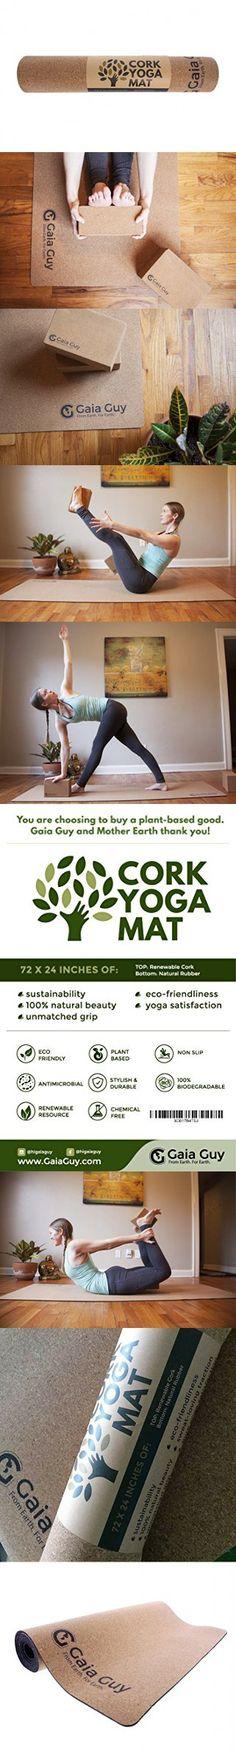 "Natural Cork and Natural Rubber Yoga Mat, 72"" x 24"" x 5mm Thick. Non-slip, Eco-friendly Yoga Mats!"